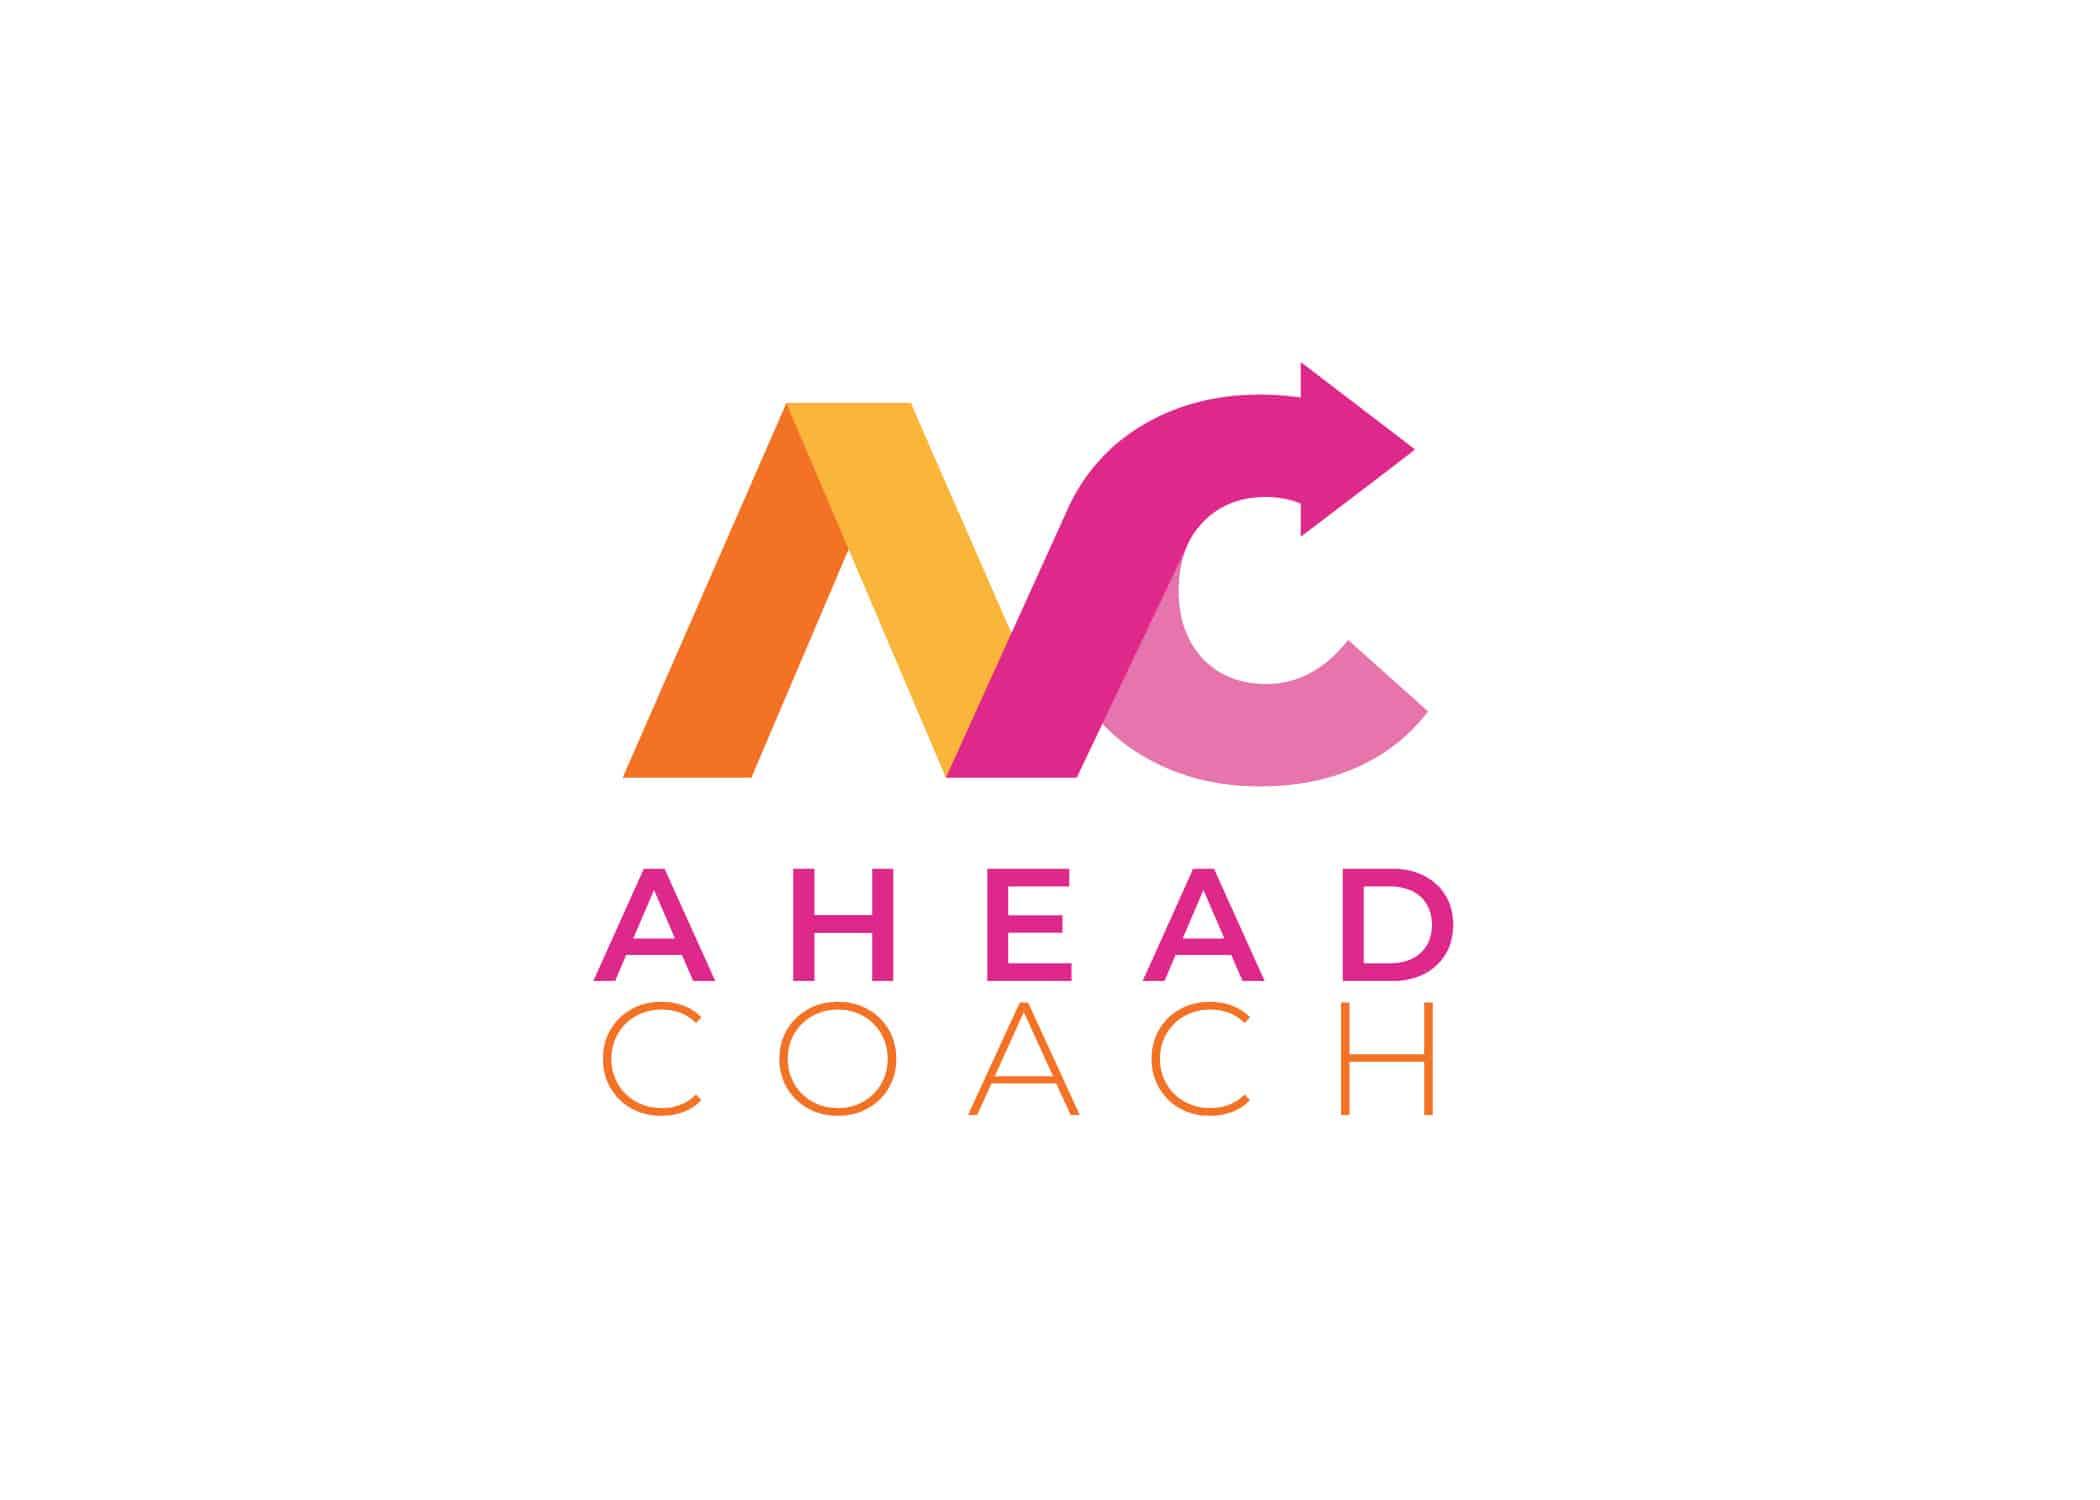 Ahead Coach logo design in vivid orange and magenta. Created mood boards to inspire this logo design.